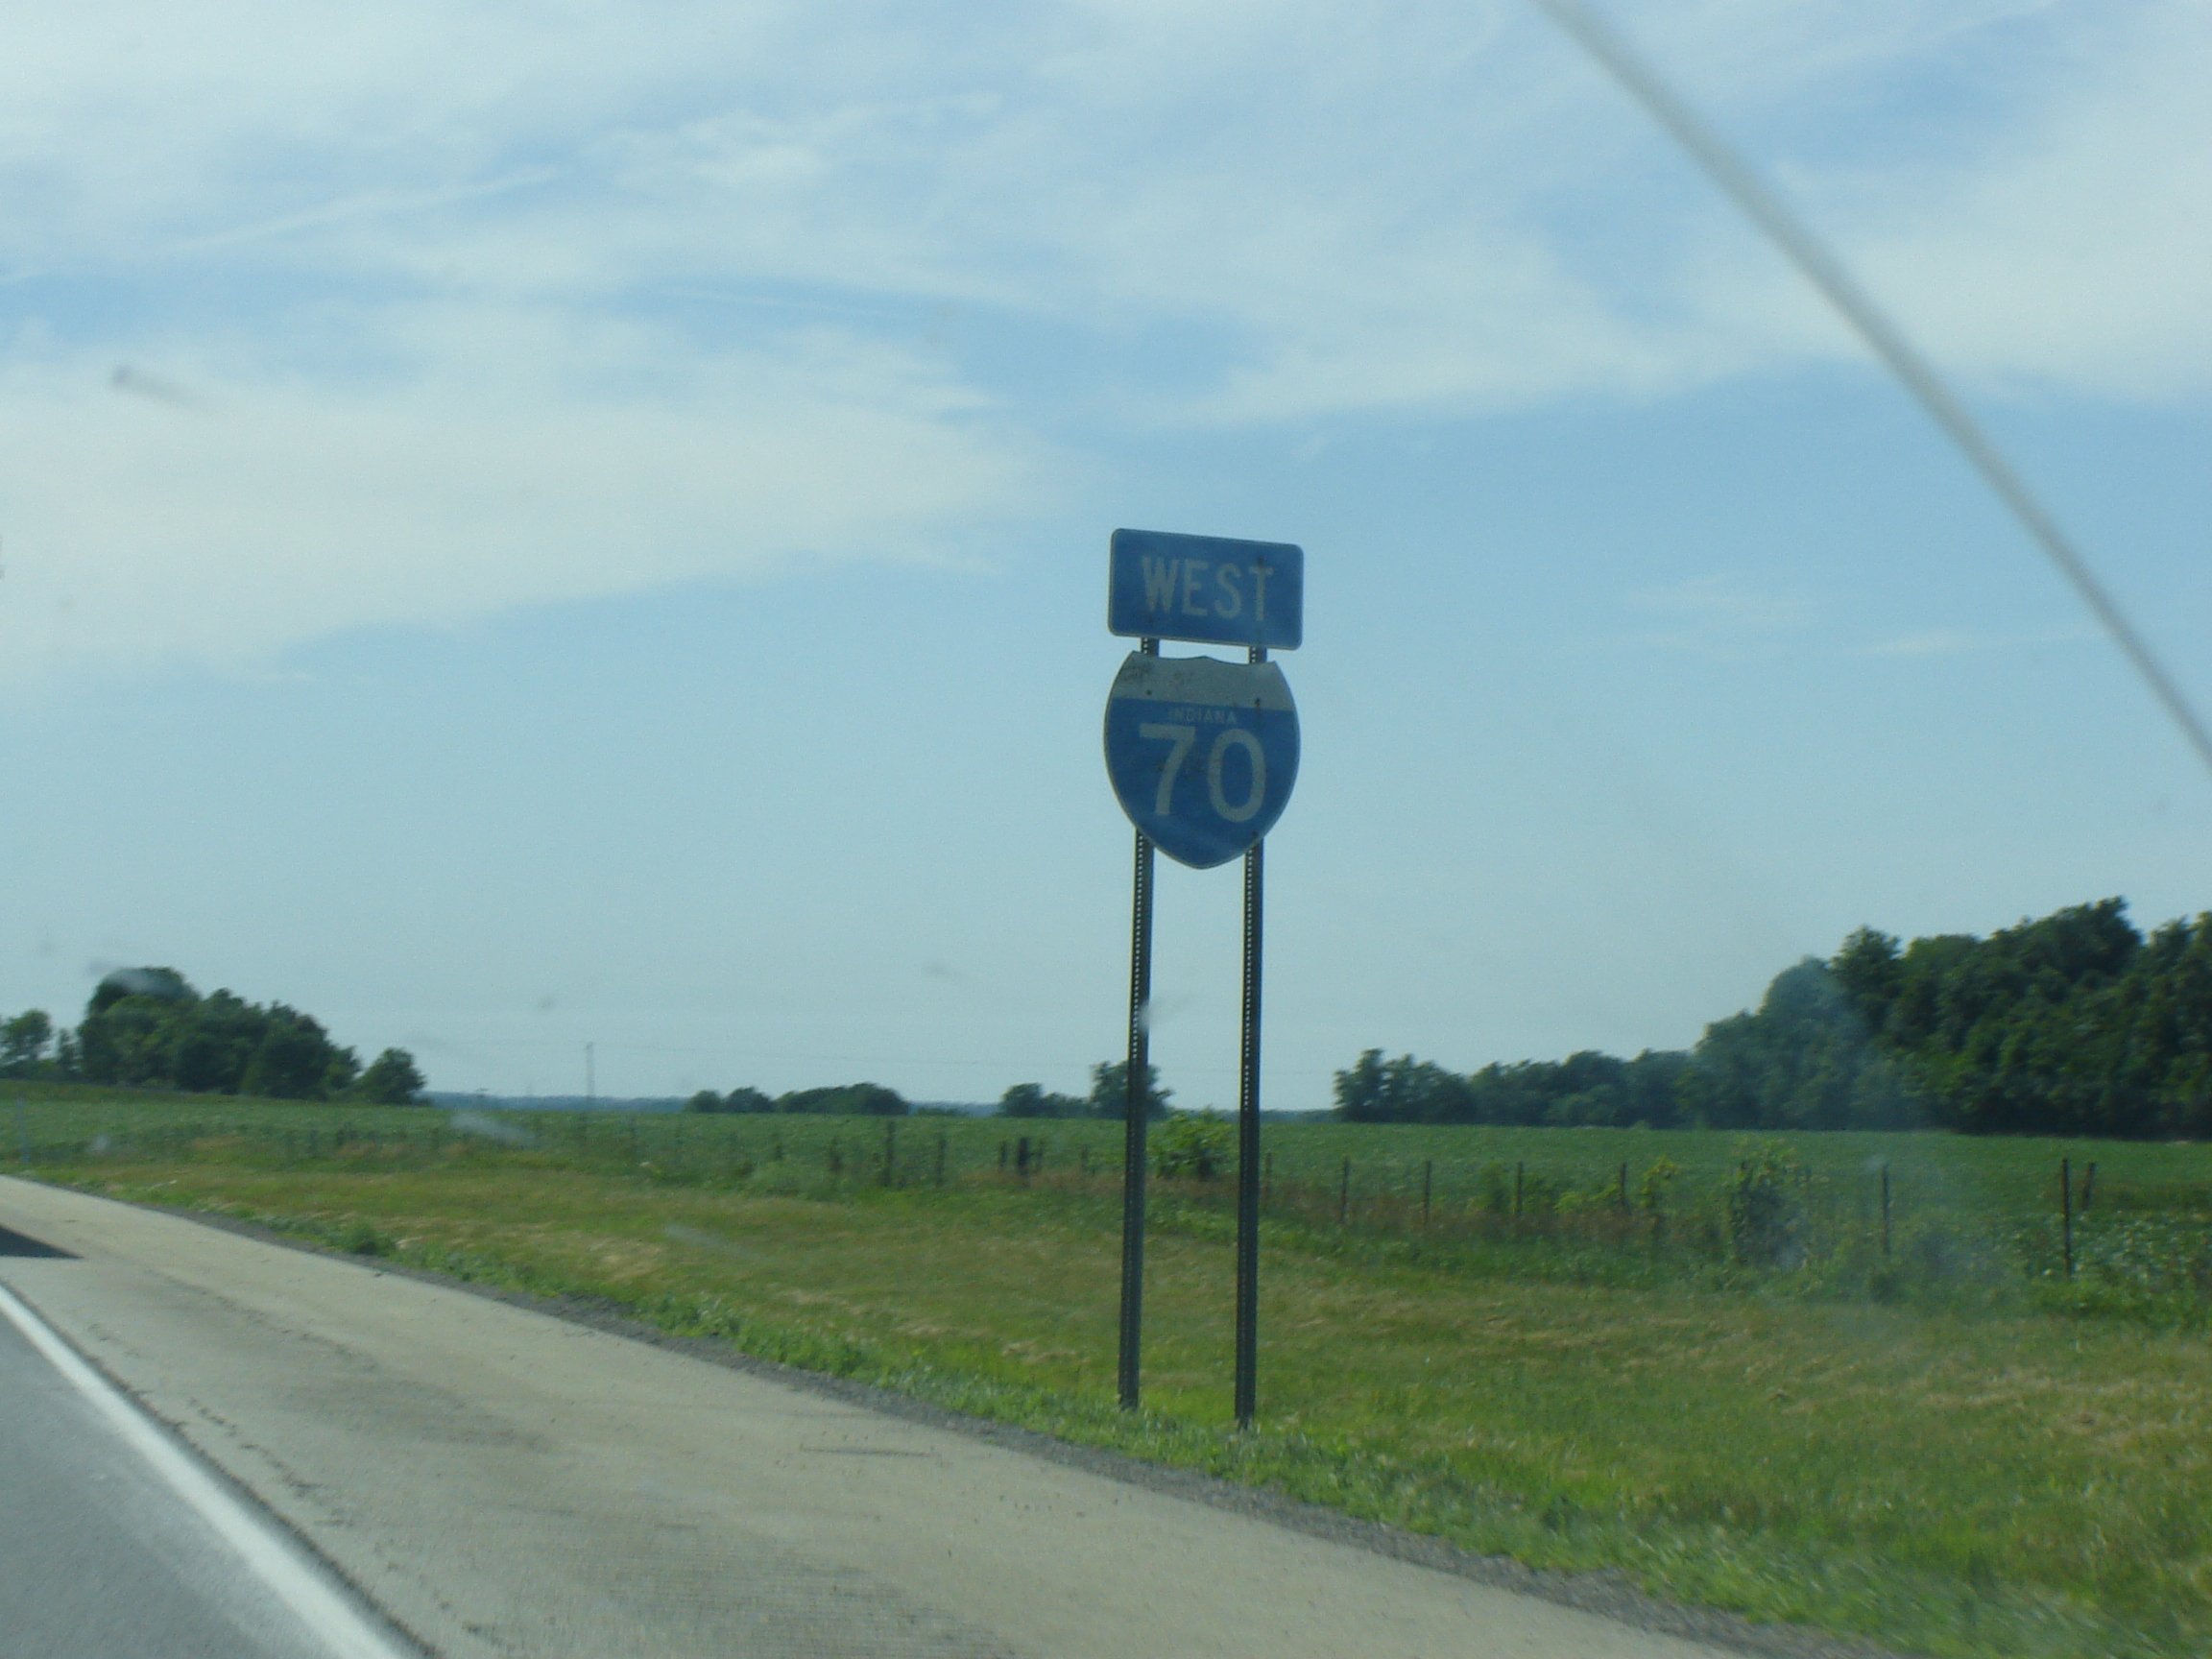 Interstate 70 in Indiana - Wikipedia